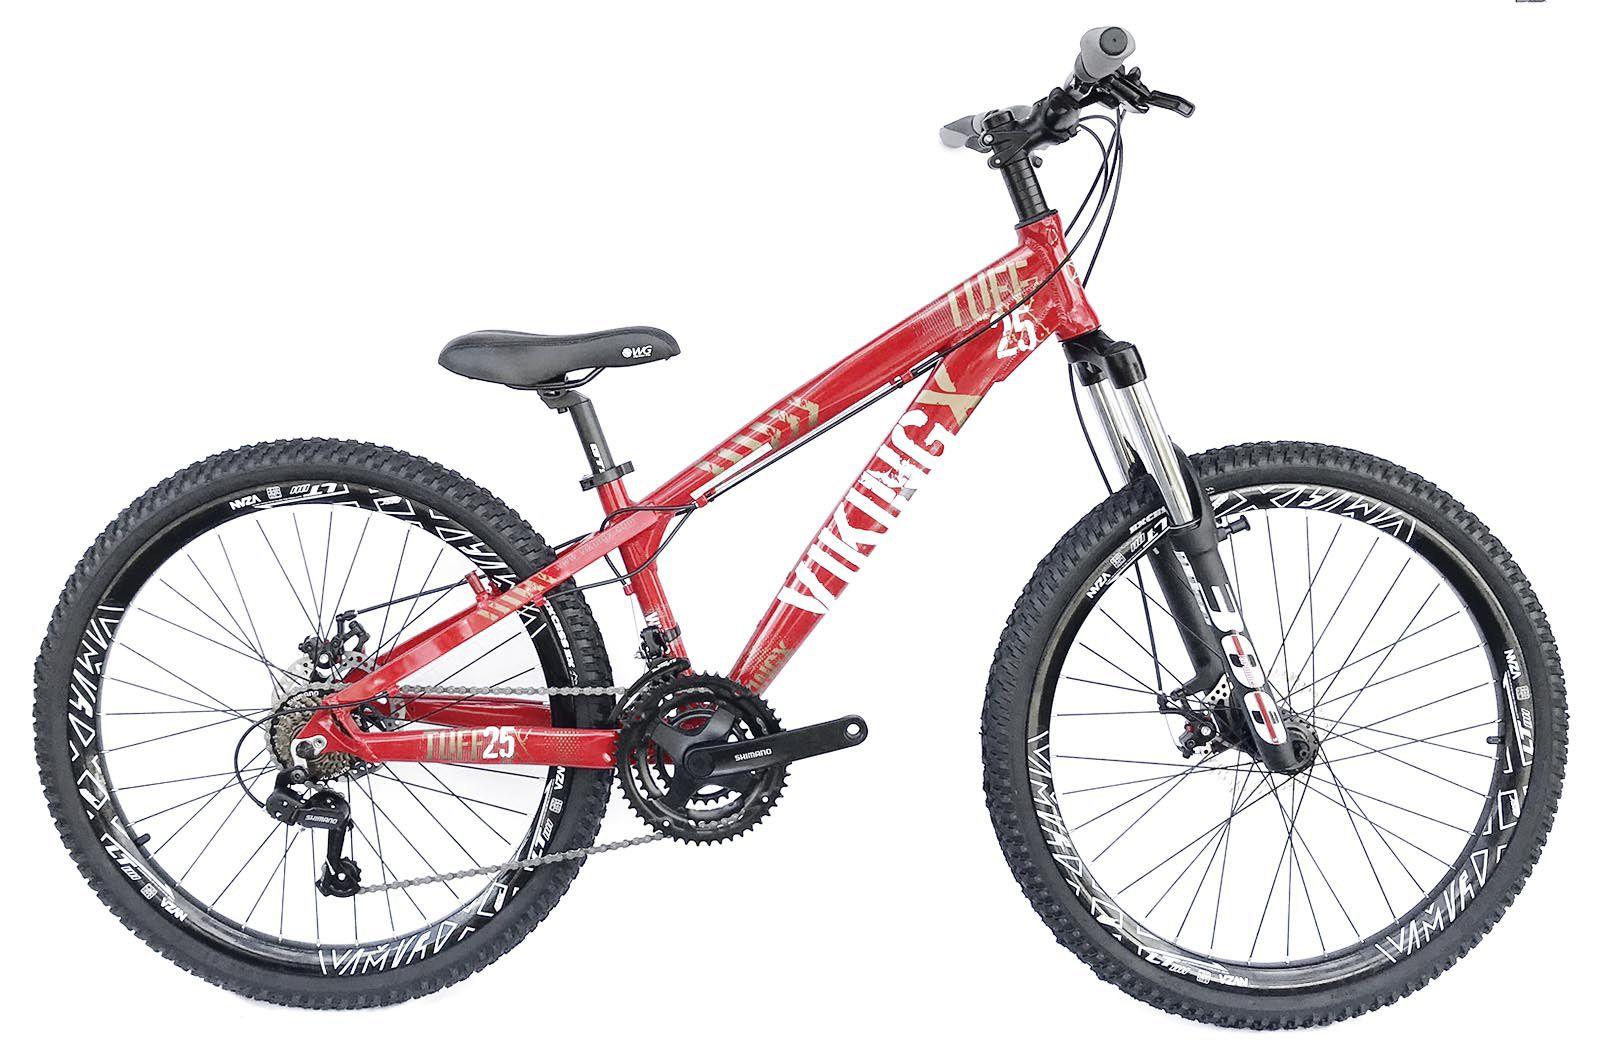 Bicicleta Aro 26 Viking 21v Shimano Freio a Disco Suspensao Spinner 300